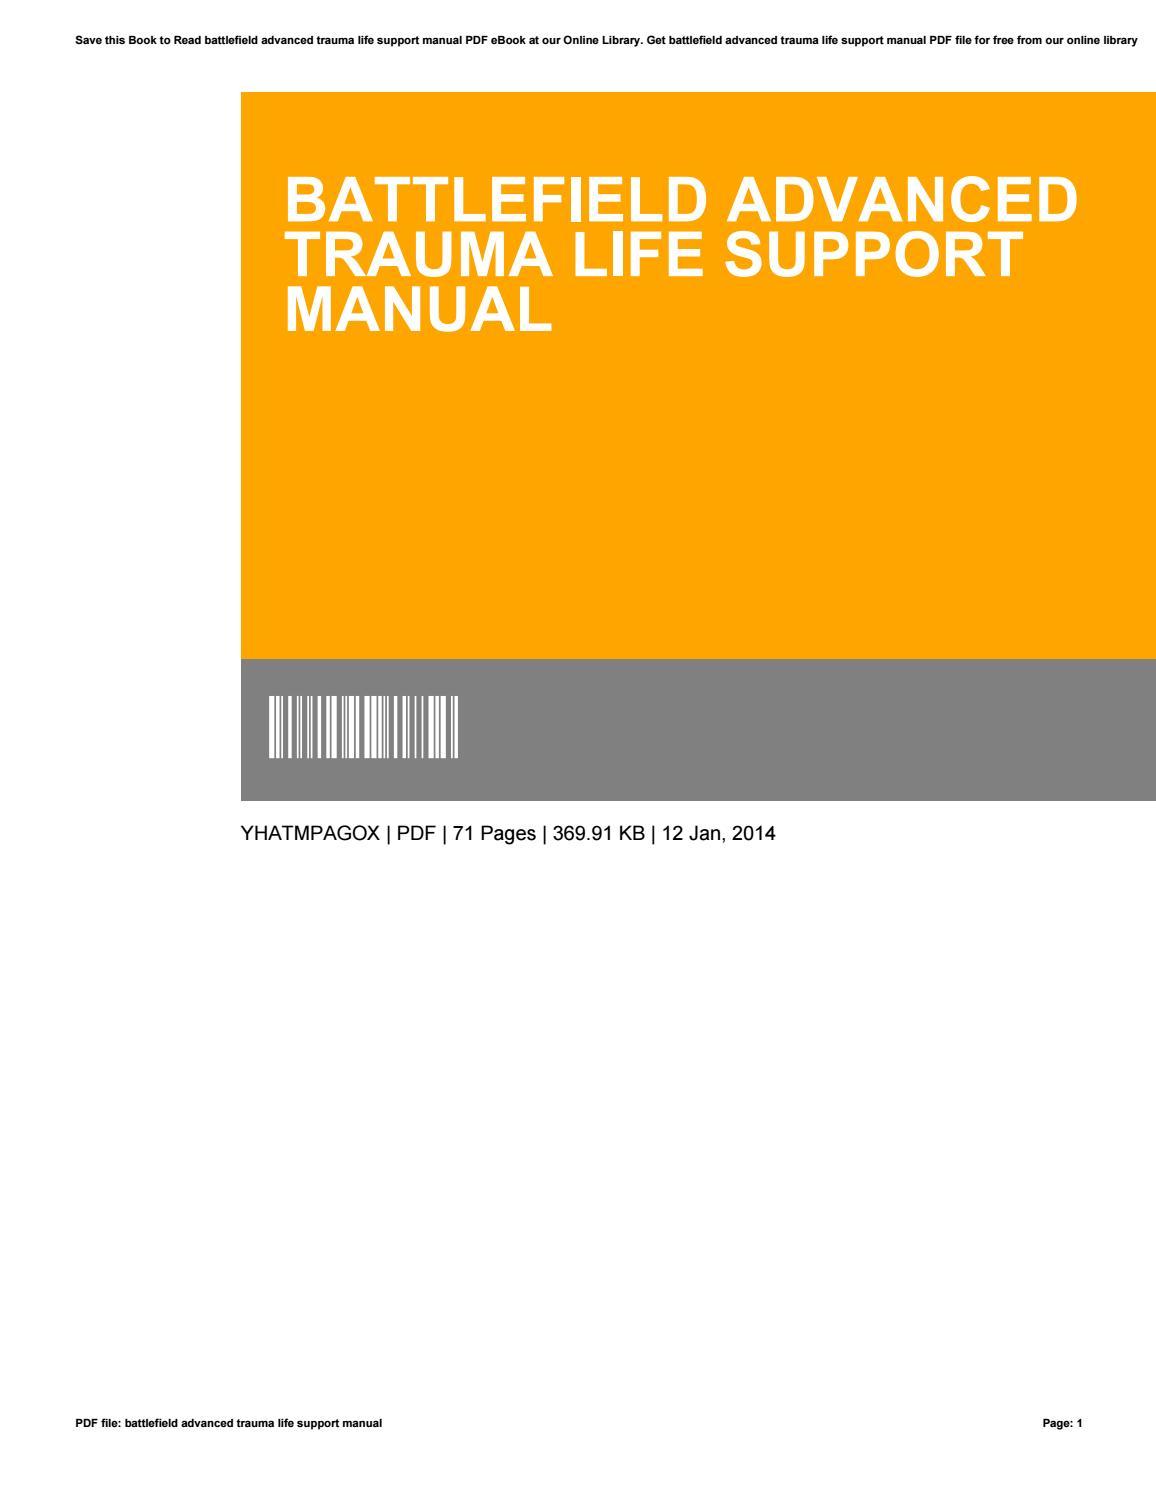 Battlefield advanced trauma life support manual by PeterWagner1757 - issuu